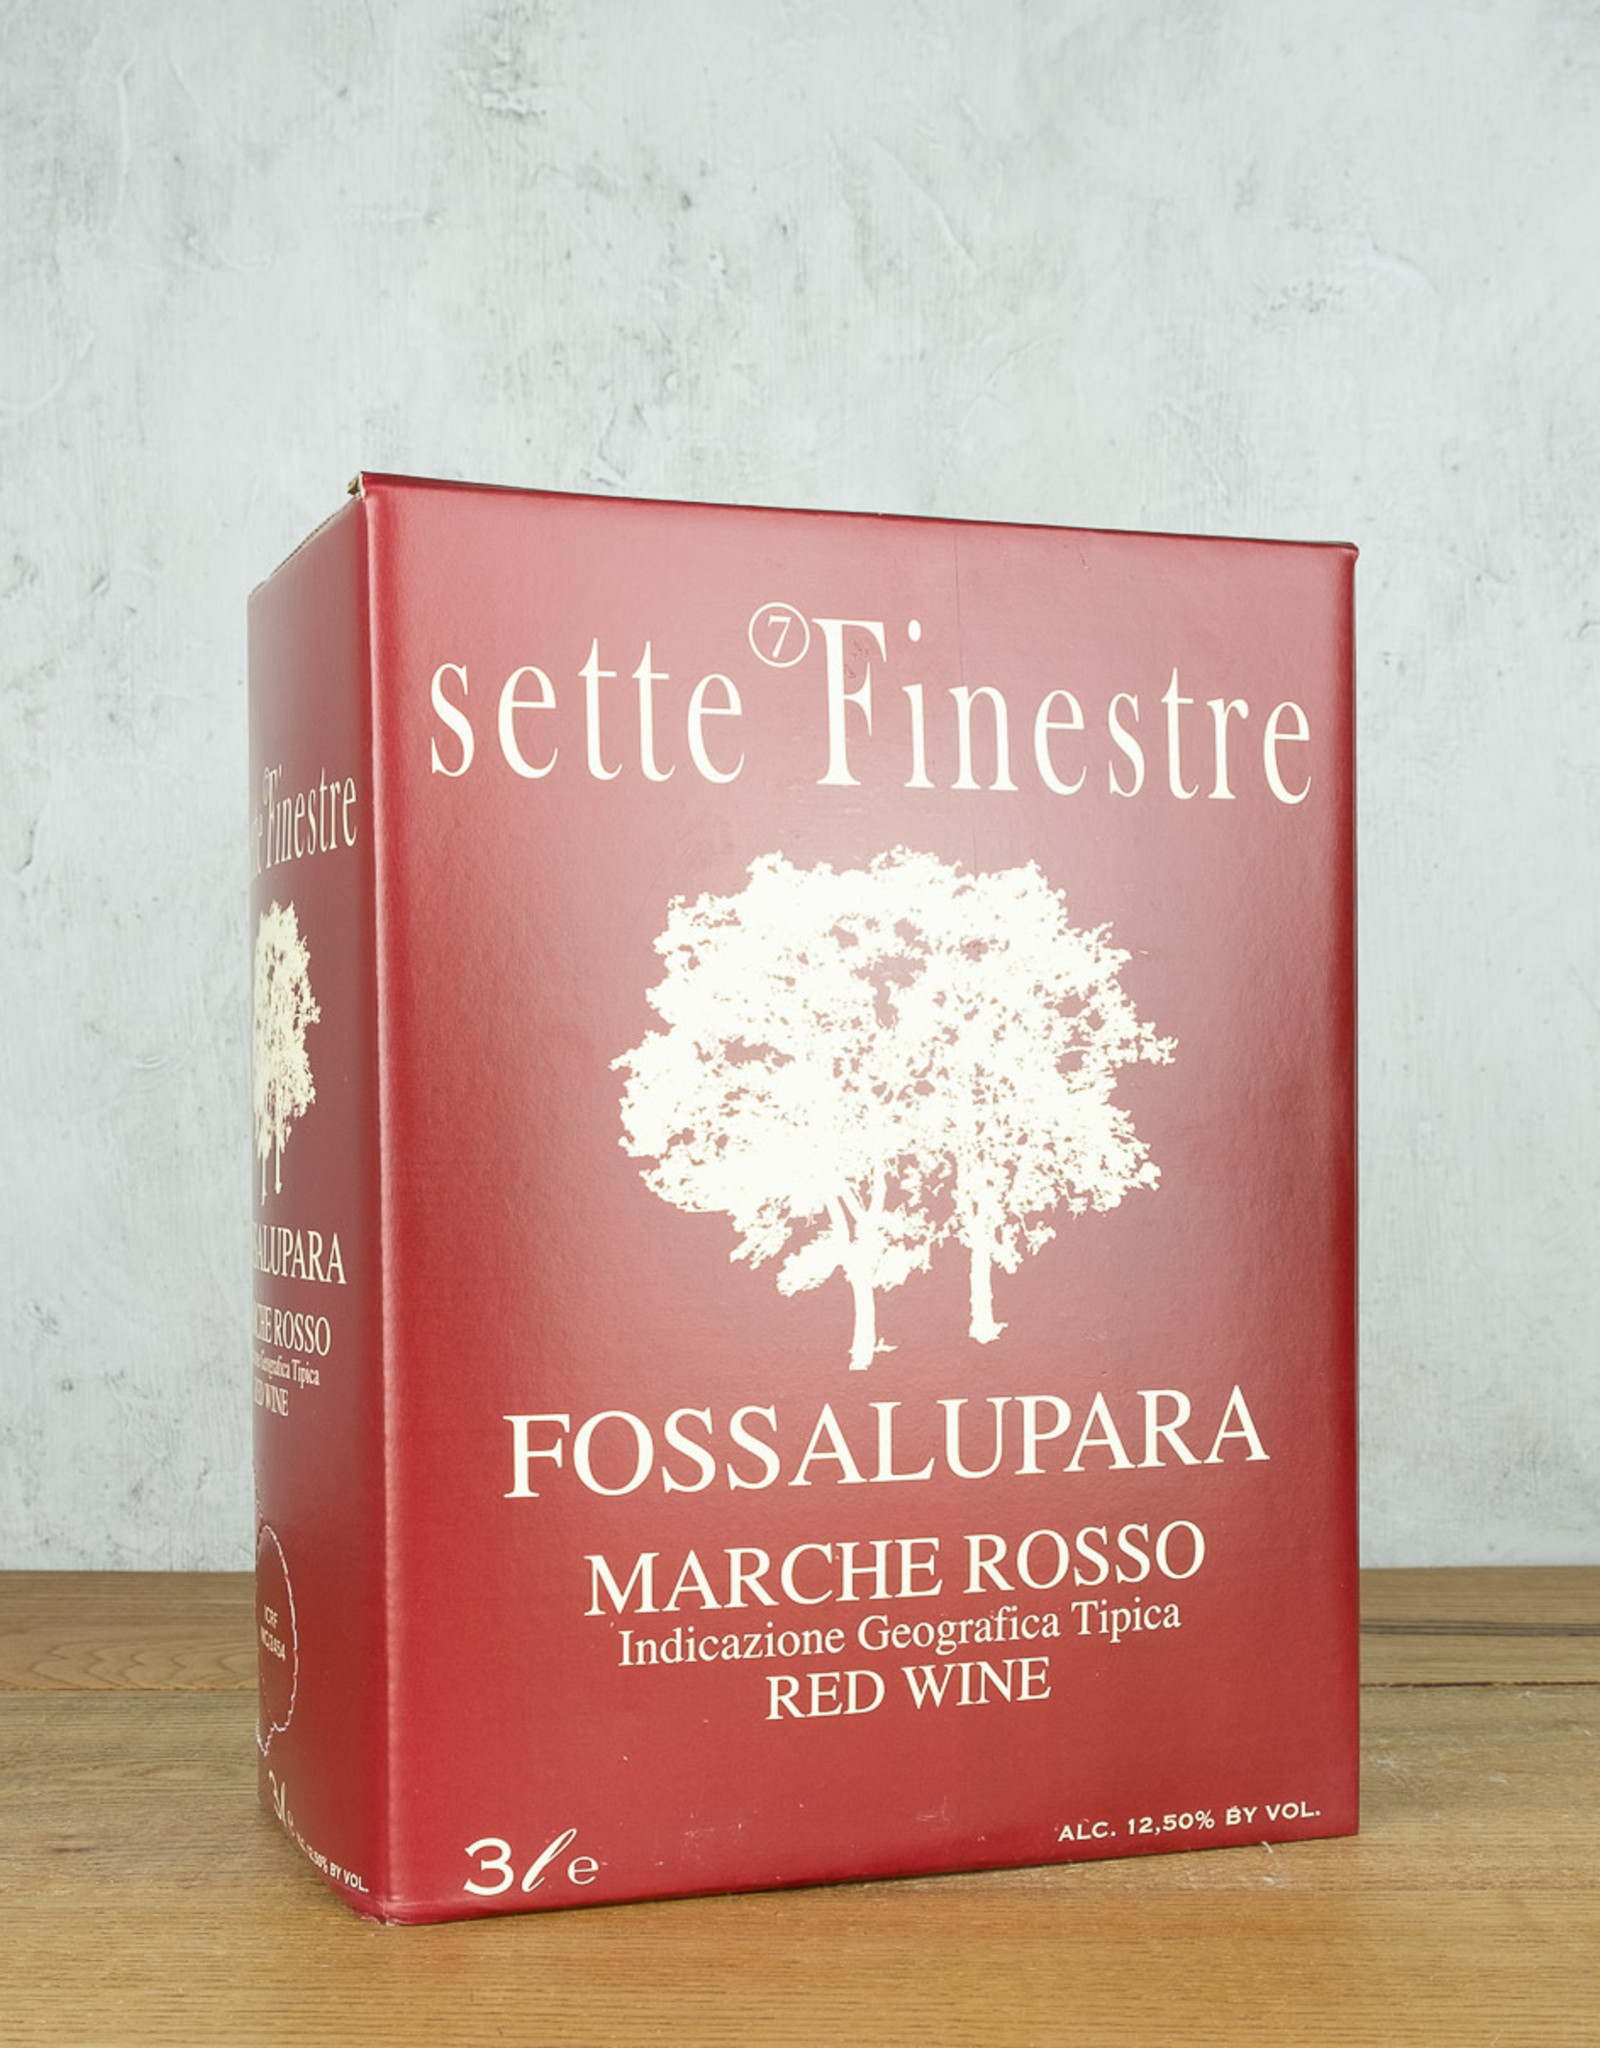 Sette Finestre Fossalupara 3L